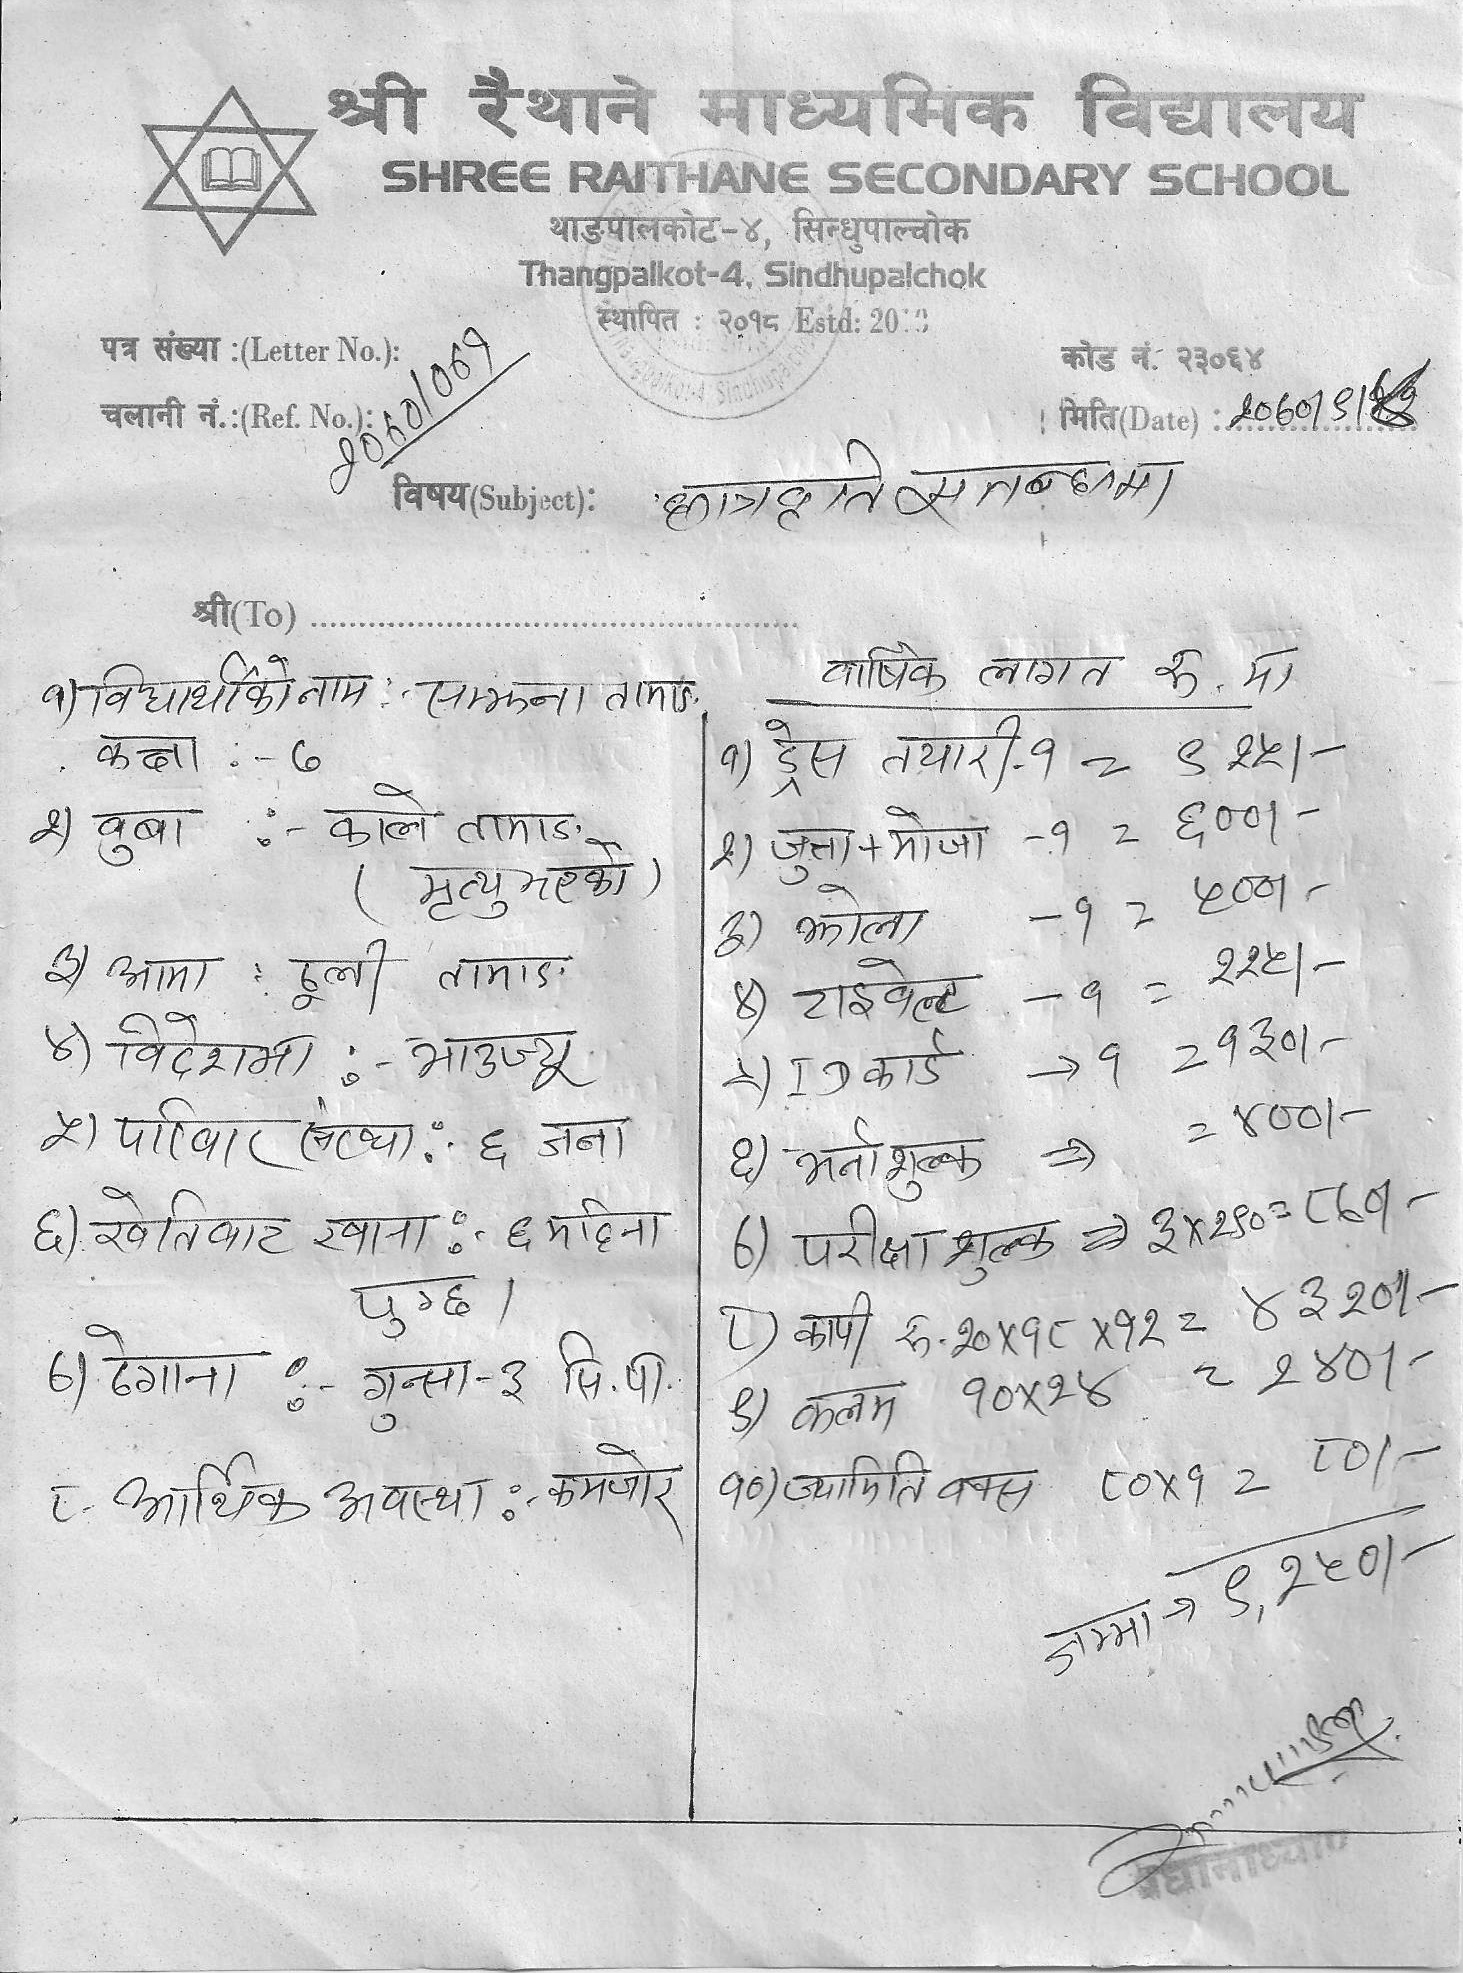 samjhana tamang - request letter